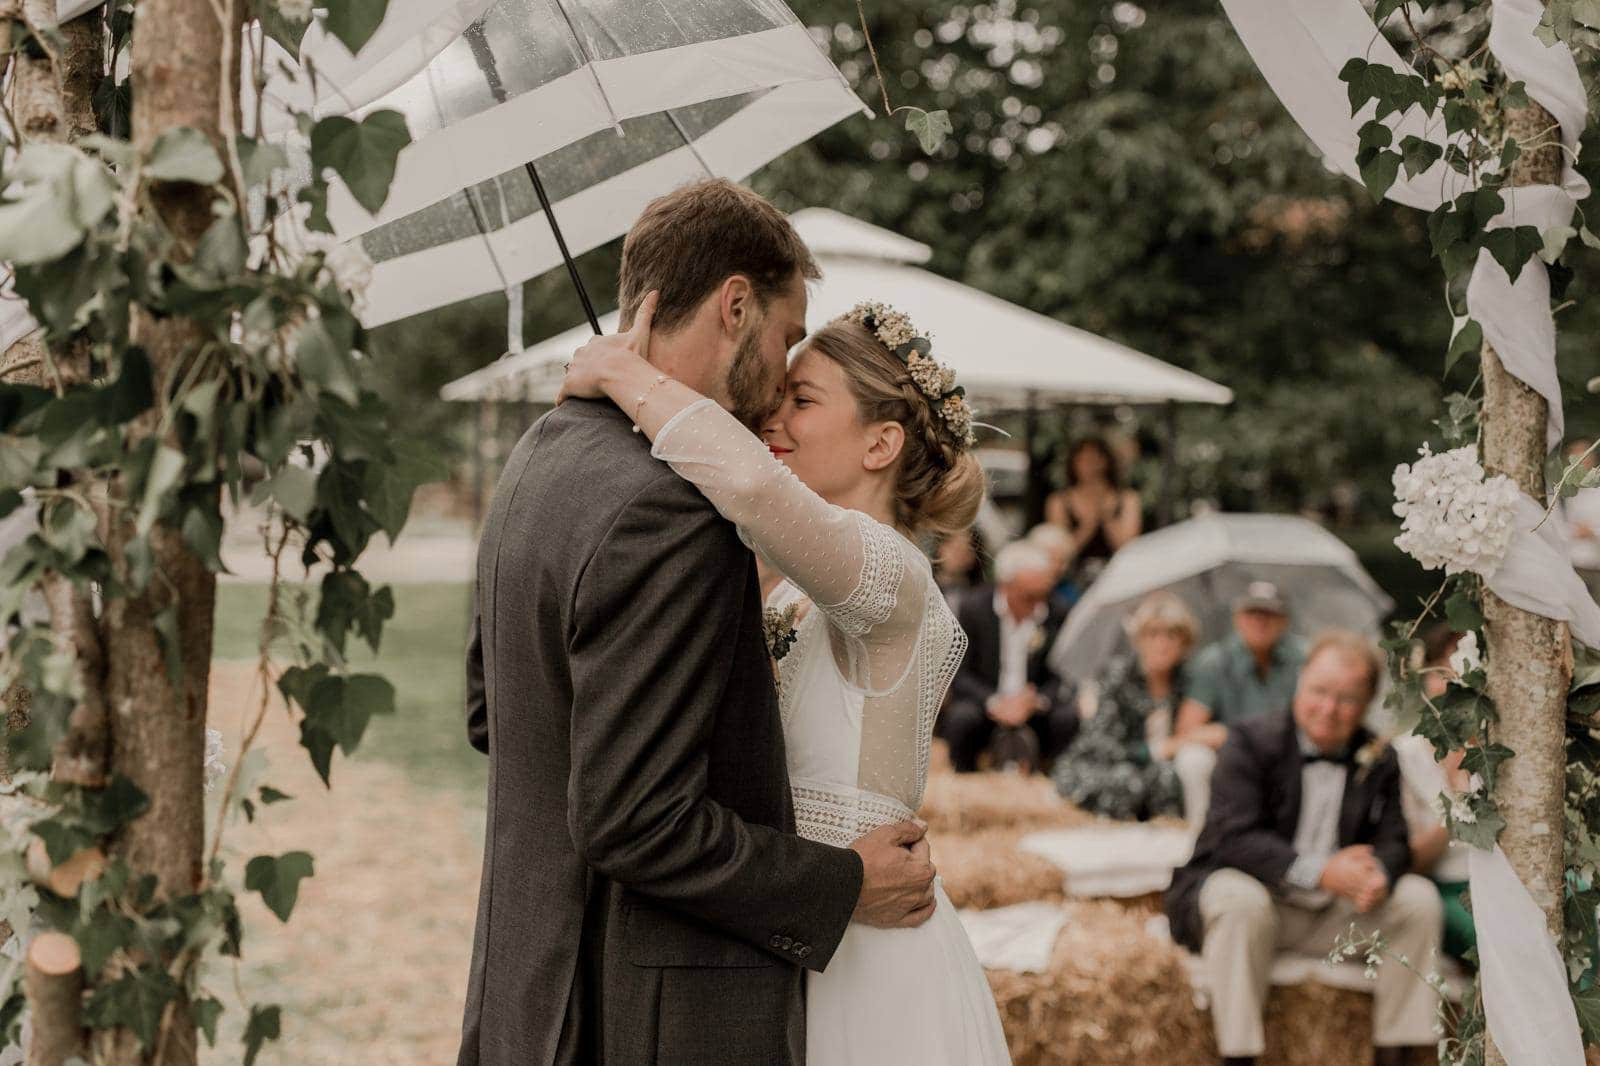 photographe et vidéaste mariage normandie bretagne elopement fun folk intimiste boheme